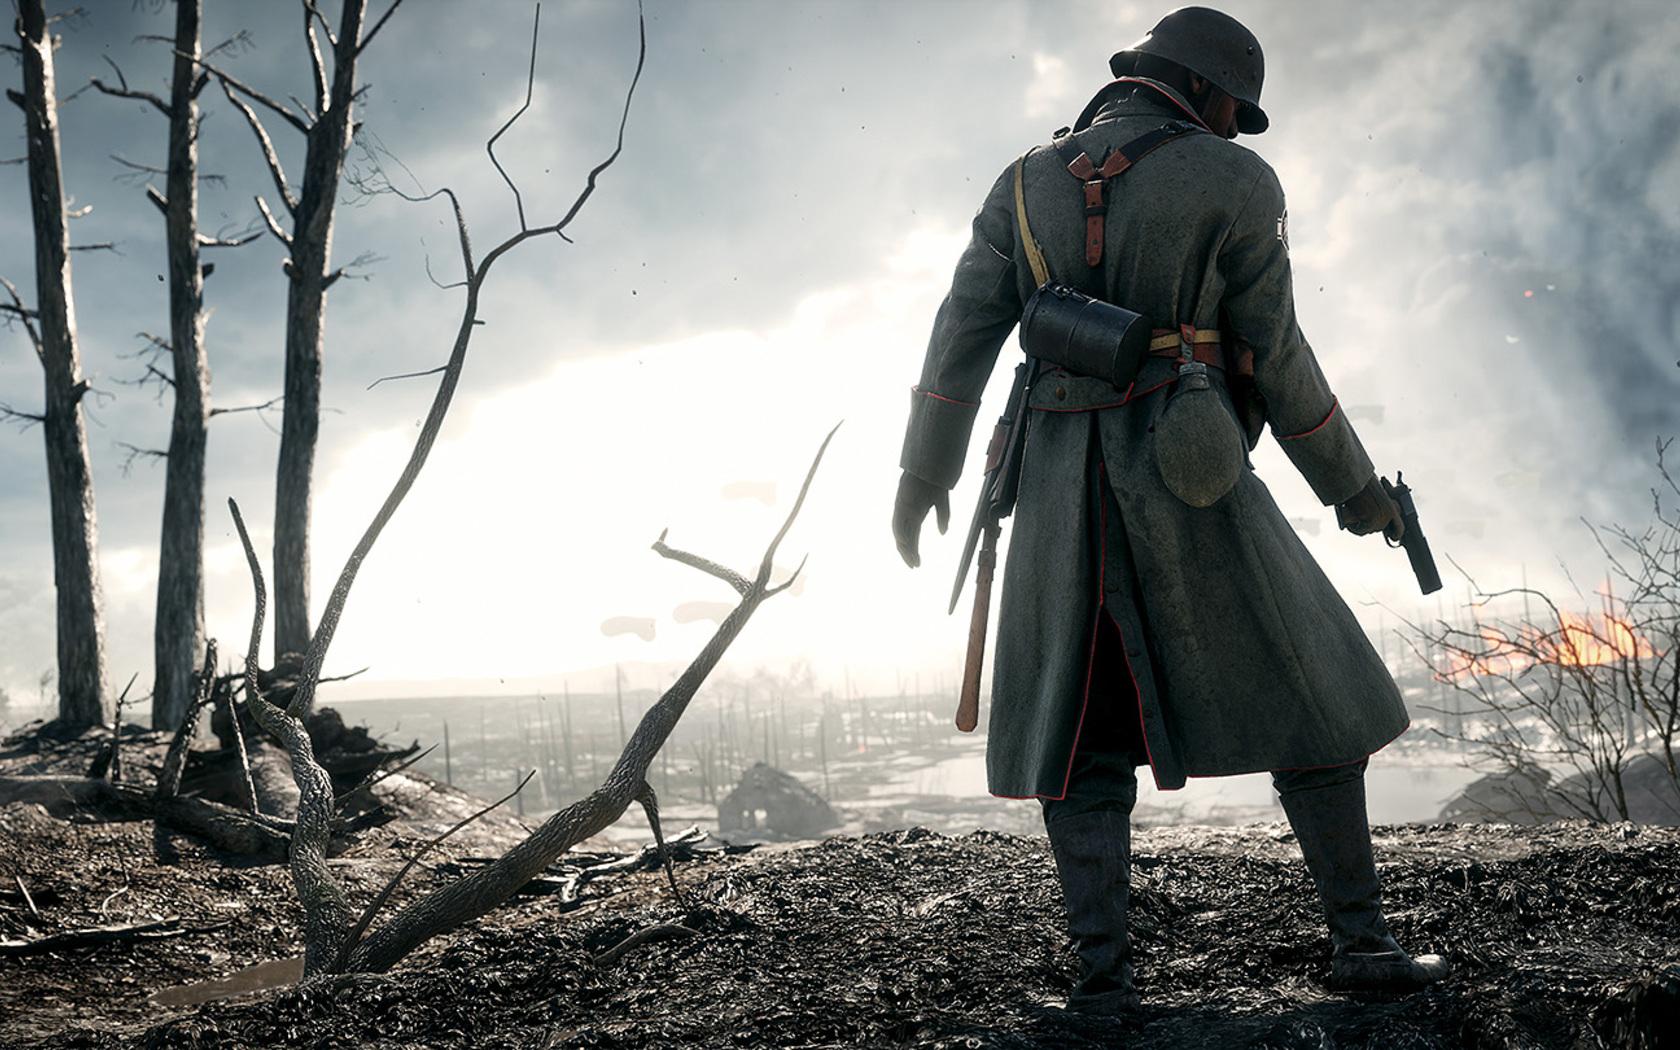 1680x1050 Battlefield 1 Game Play HD 1680x1050 Resolution